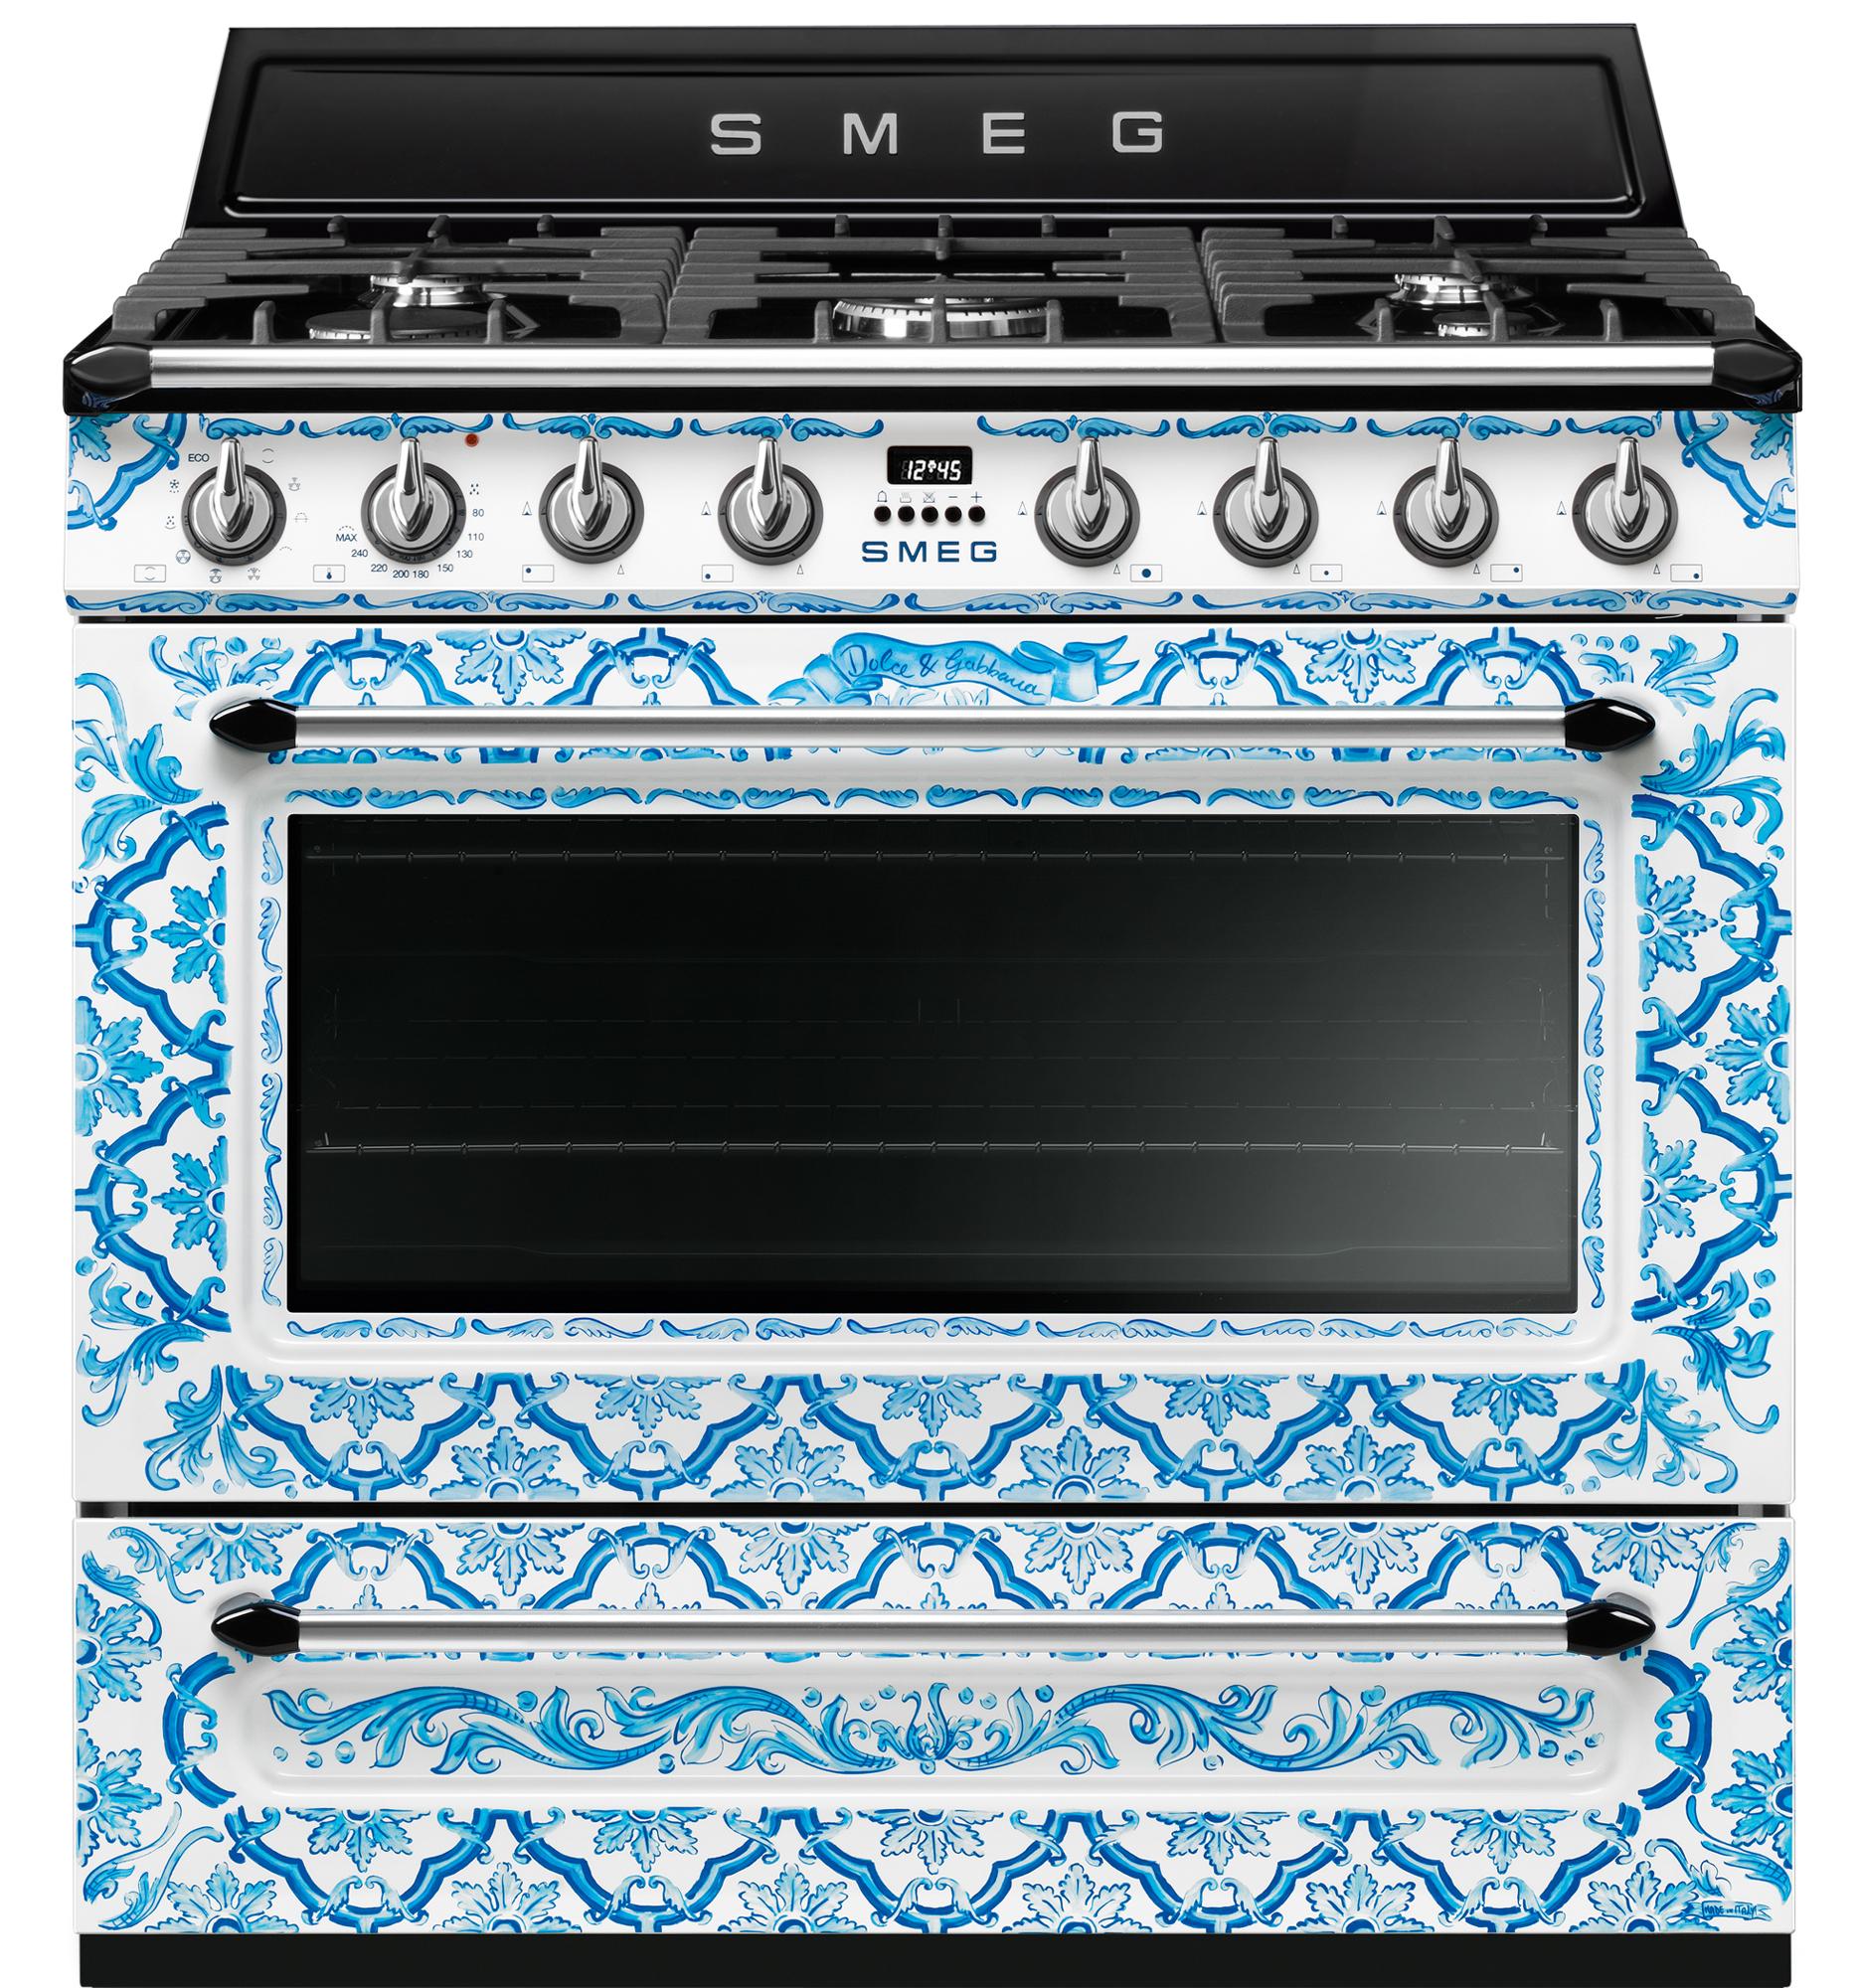 Smeg Kochzentrum Dolce Gabbana Mit Majolika Motiven